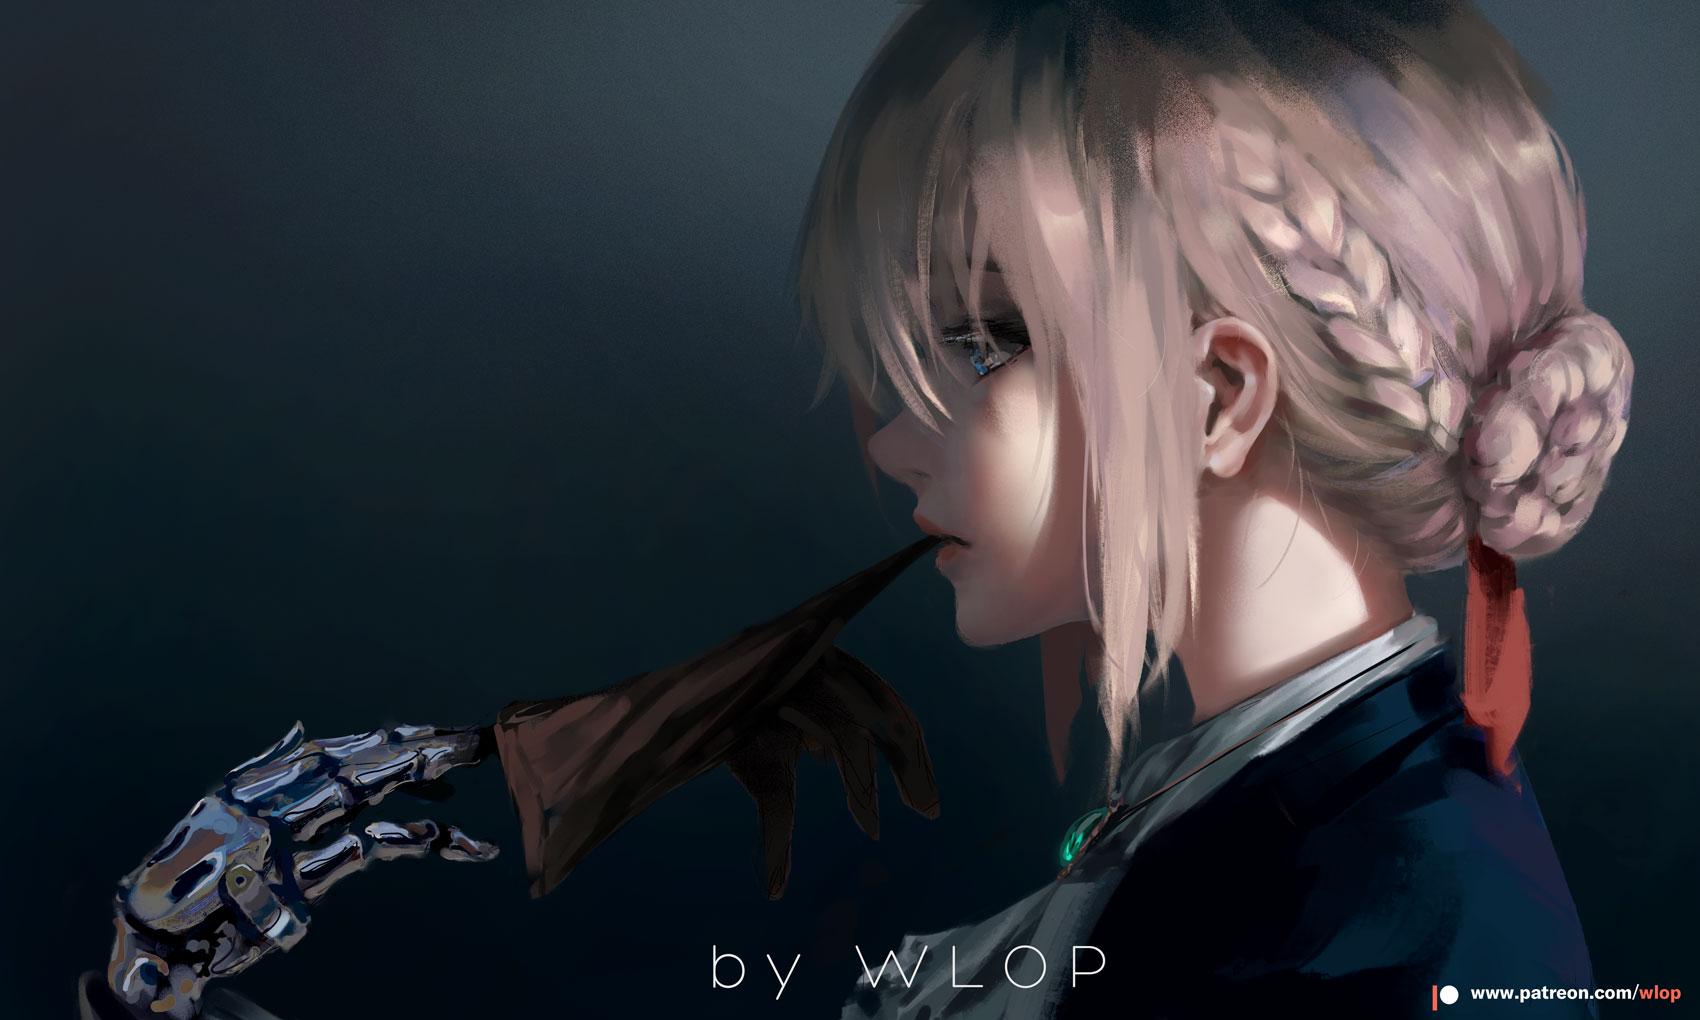 Violet Evergarden 2 by wlop